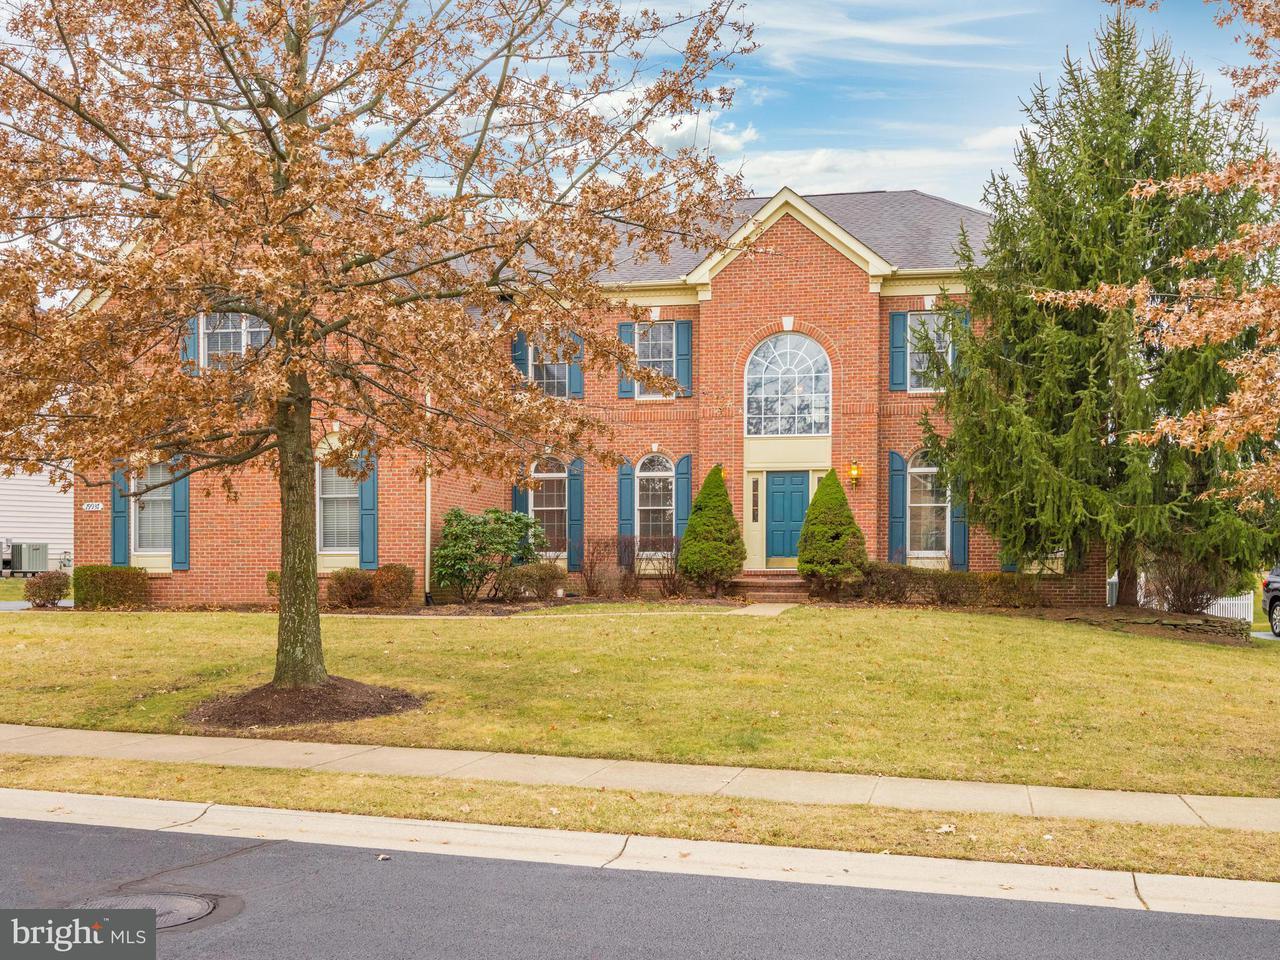 Single Family Home for Sale at 19937 Interlachen Circle 19937 Interlachen Circle Ashburn, Virginia 20147 United States